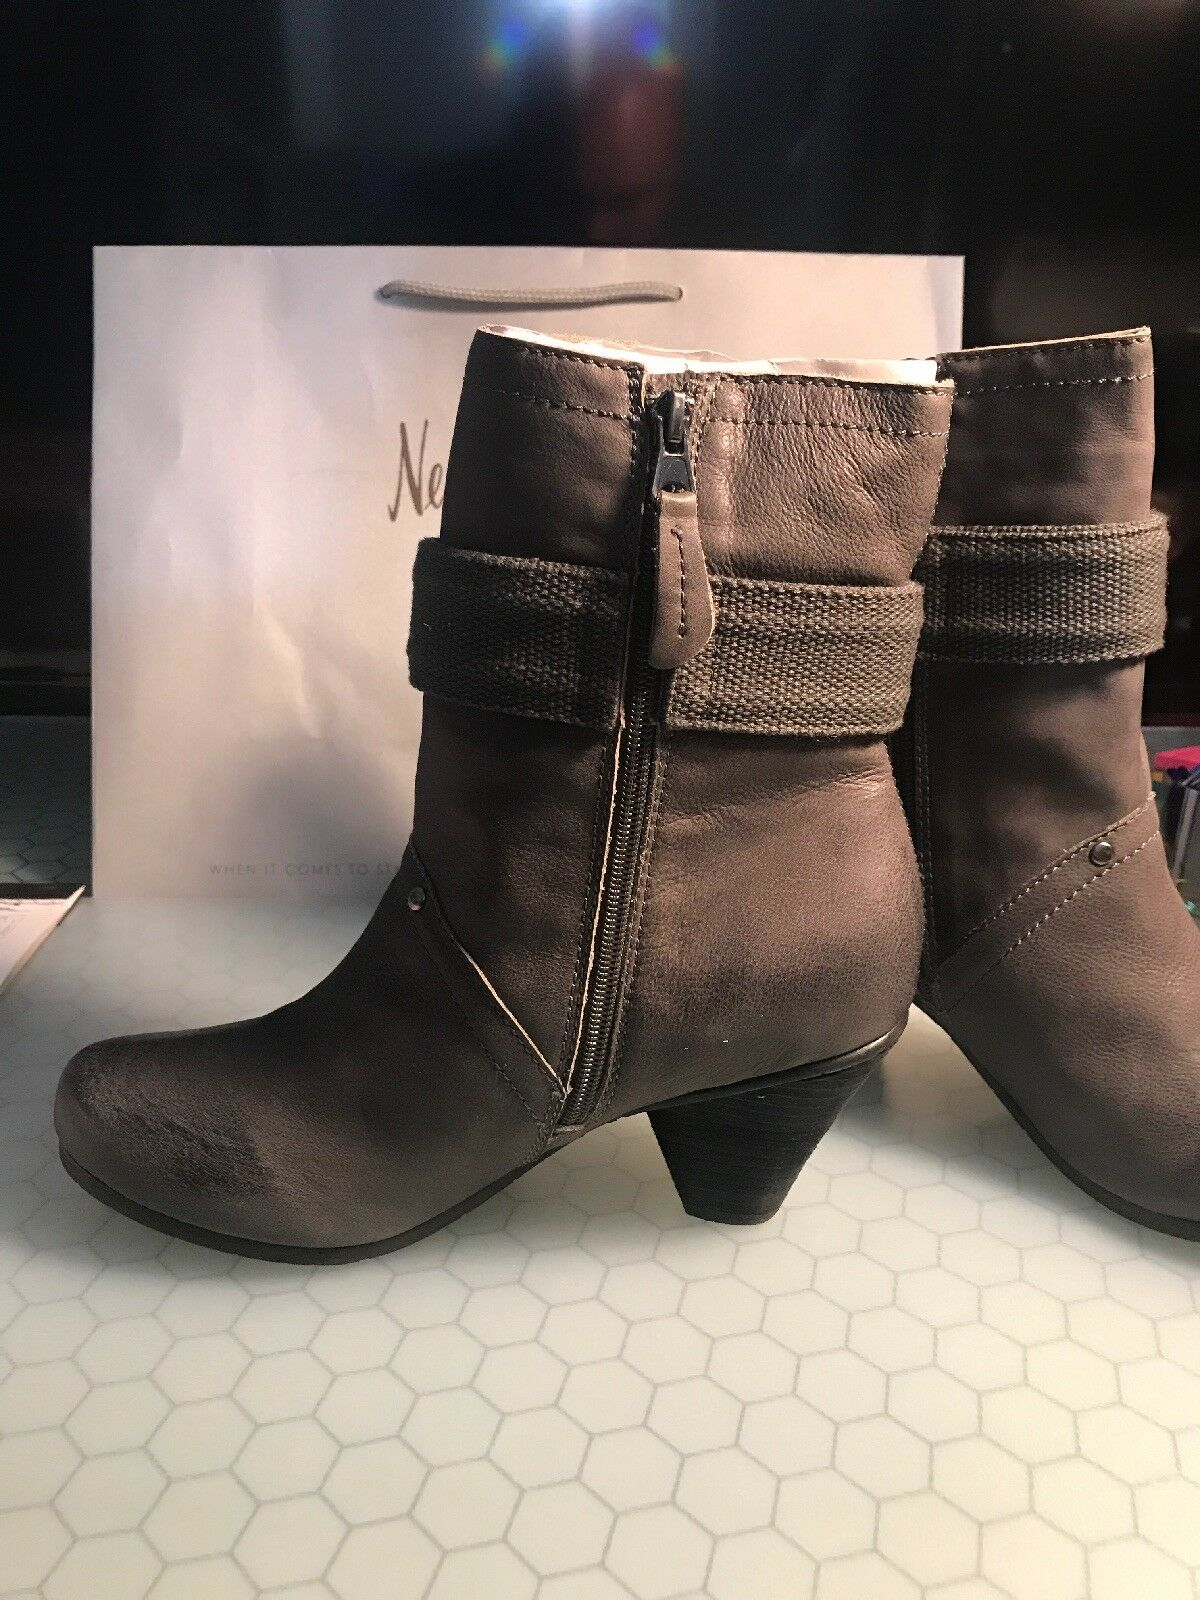 Kelsi Dagger Brooklyn Firas Leather Leather Leather Boots Charcoal Grey Size 10 NIB fe8e87